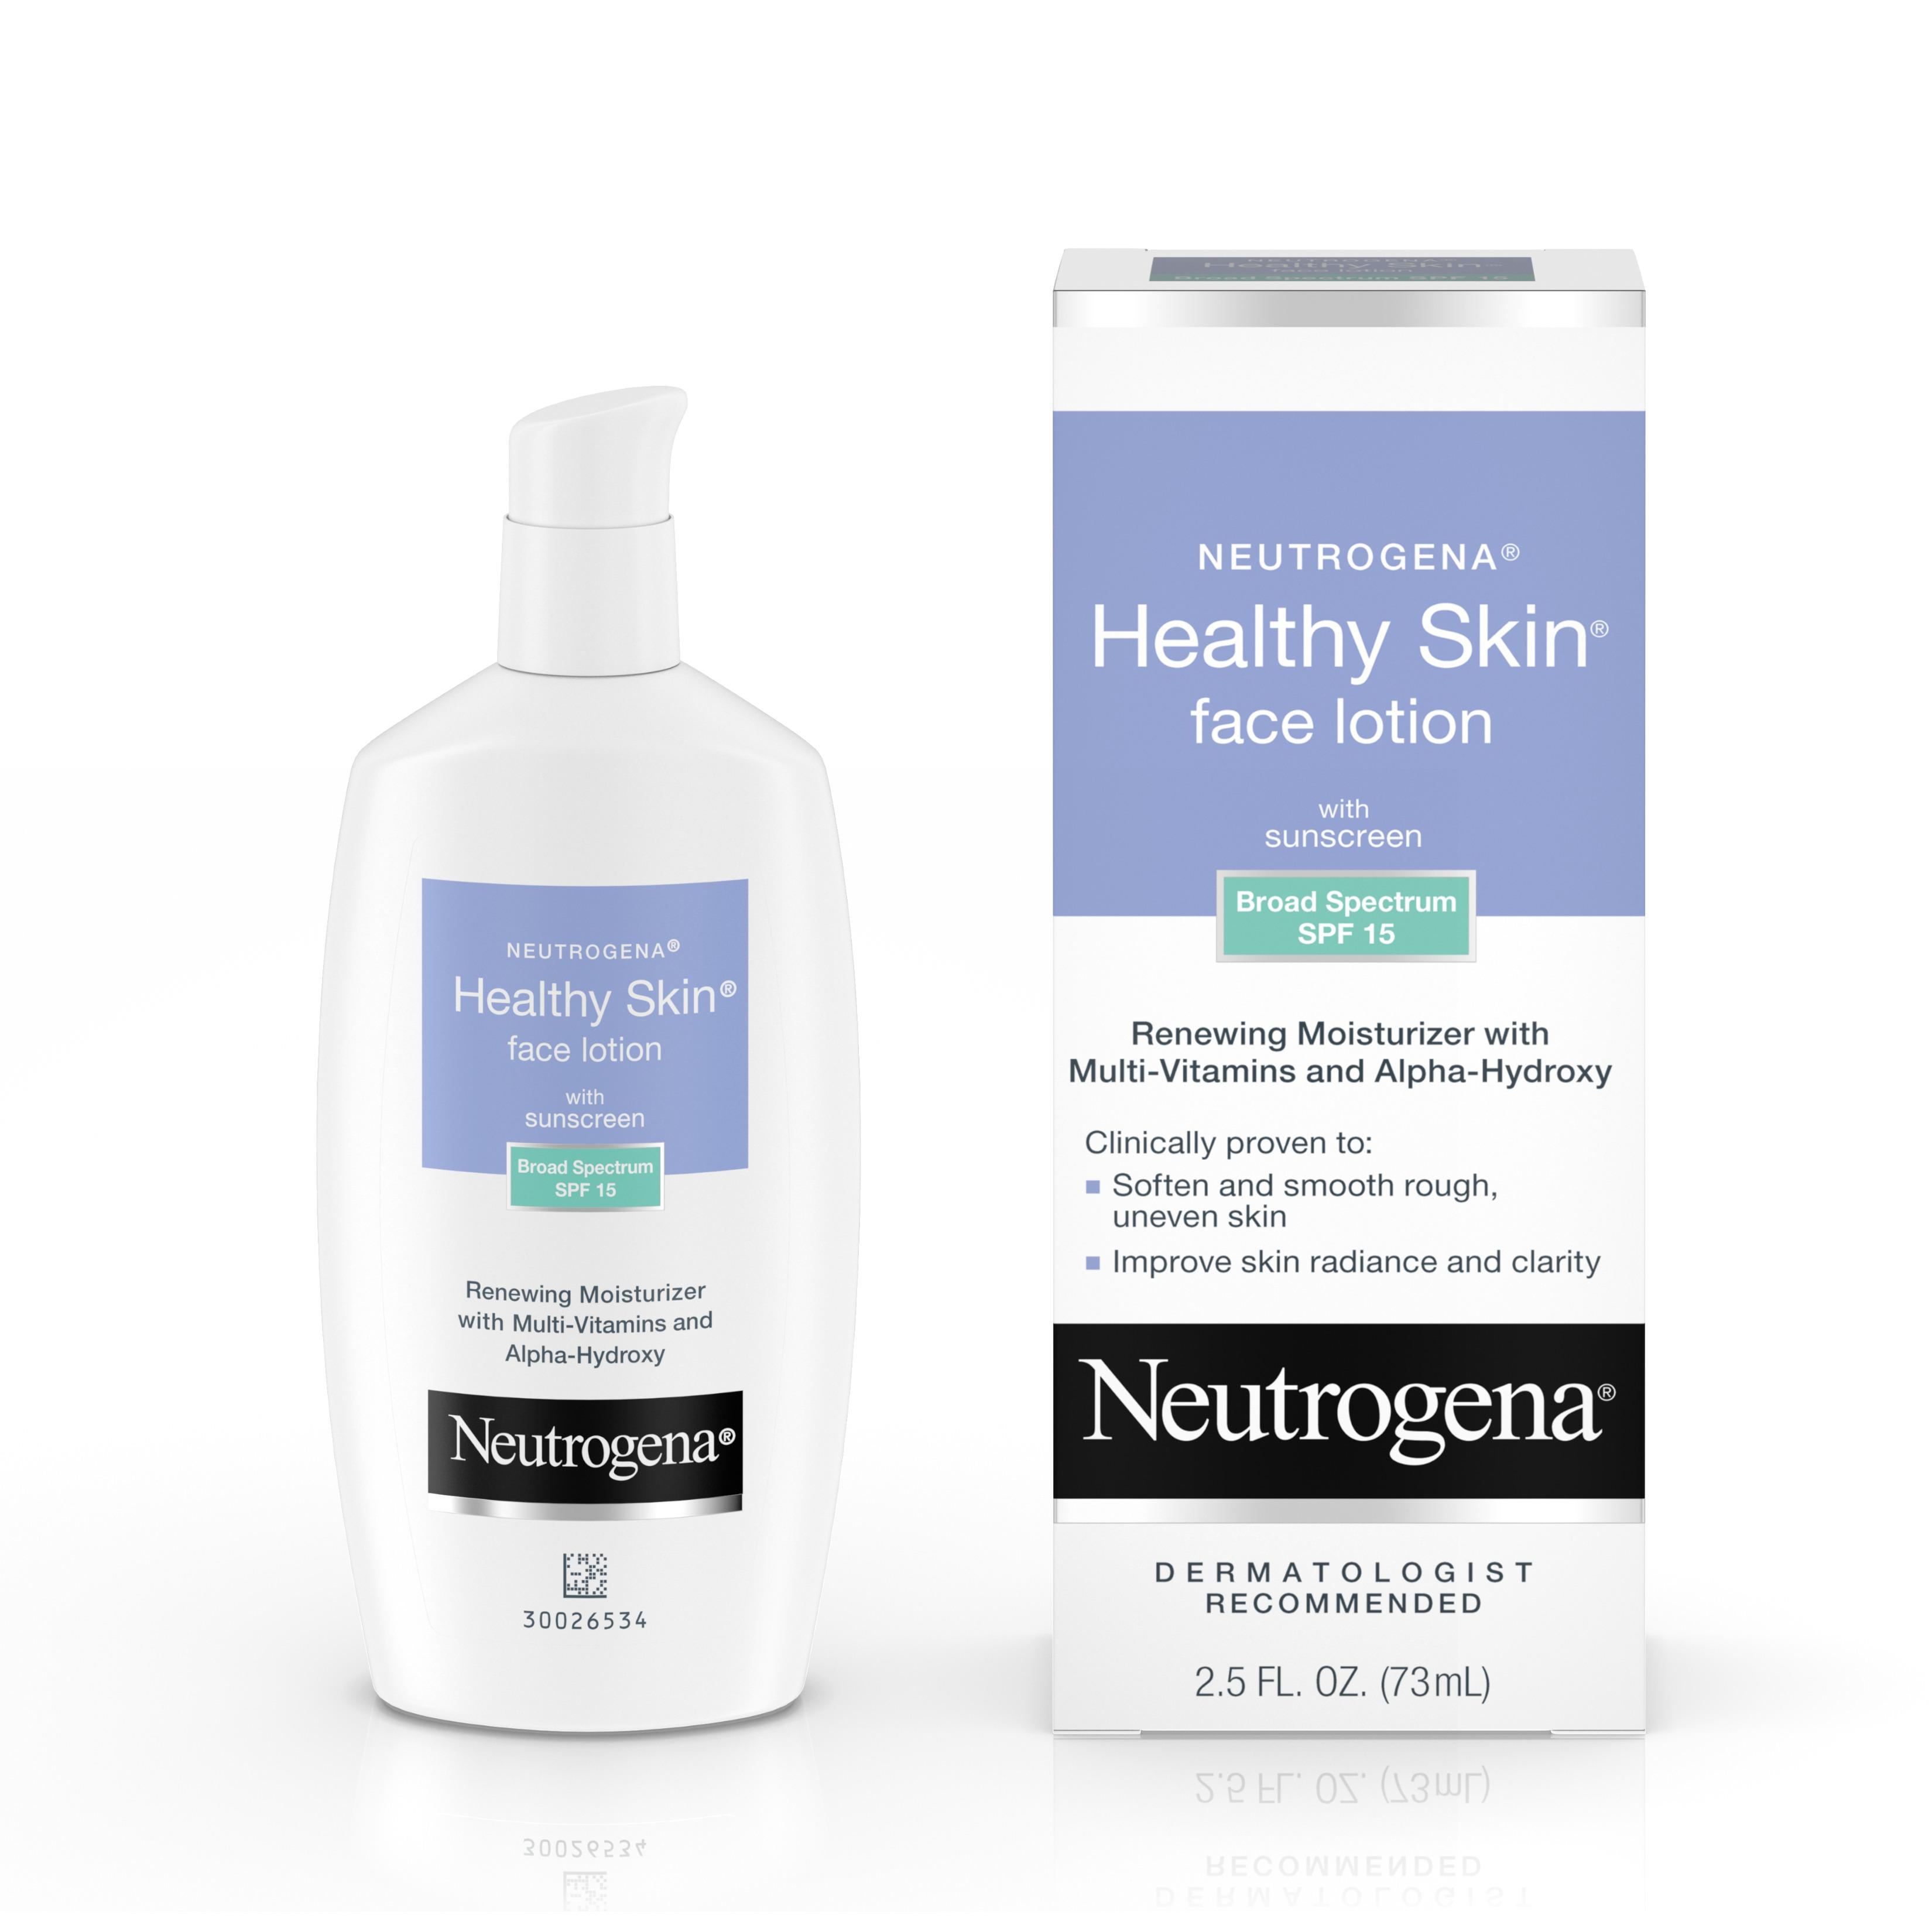 Neutrogena Healthy Skin Face Lotion with Alpha-Hydroxy Acid 2.5 fl. oz